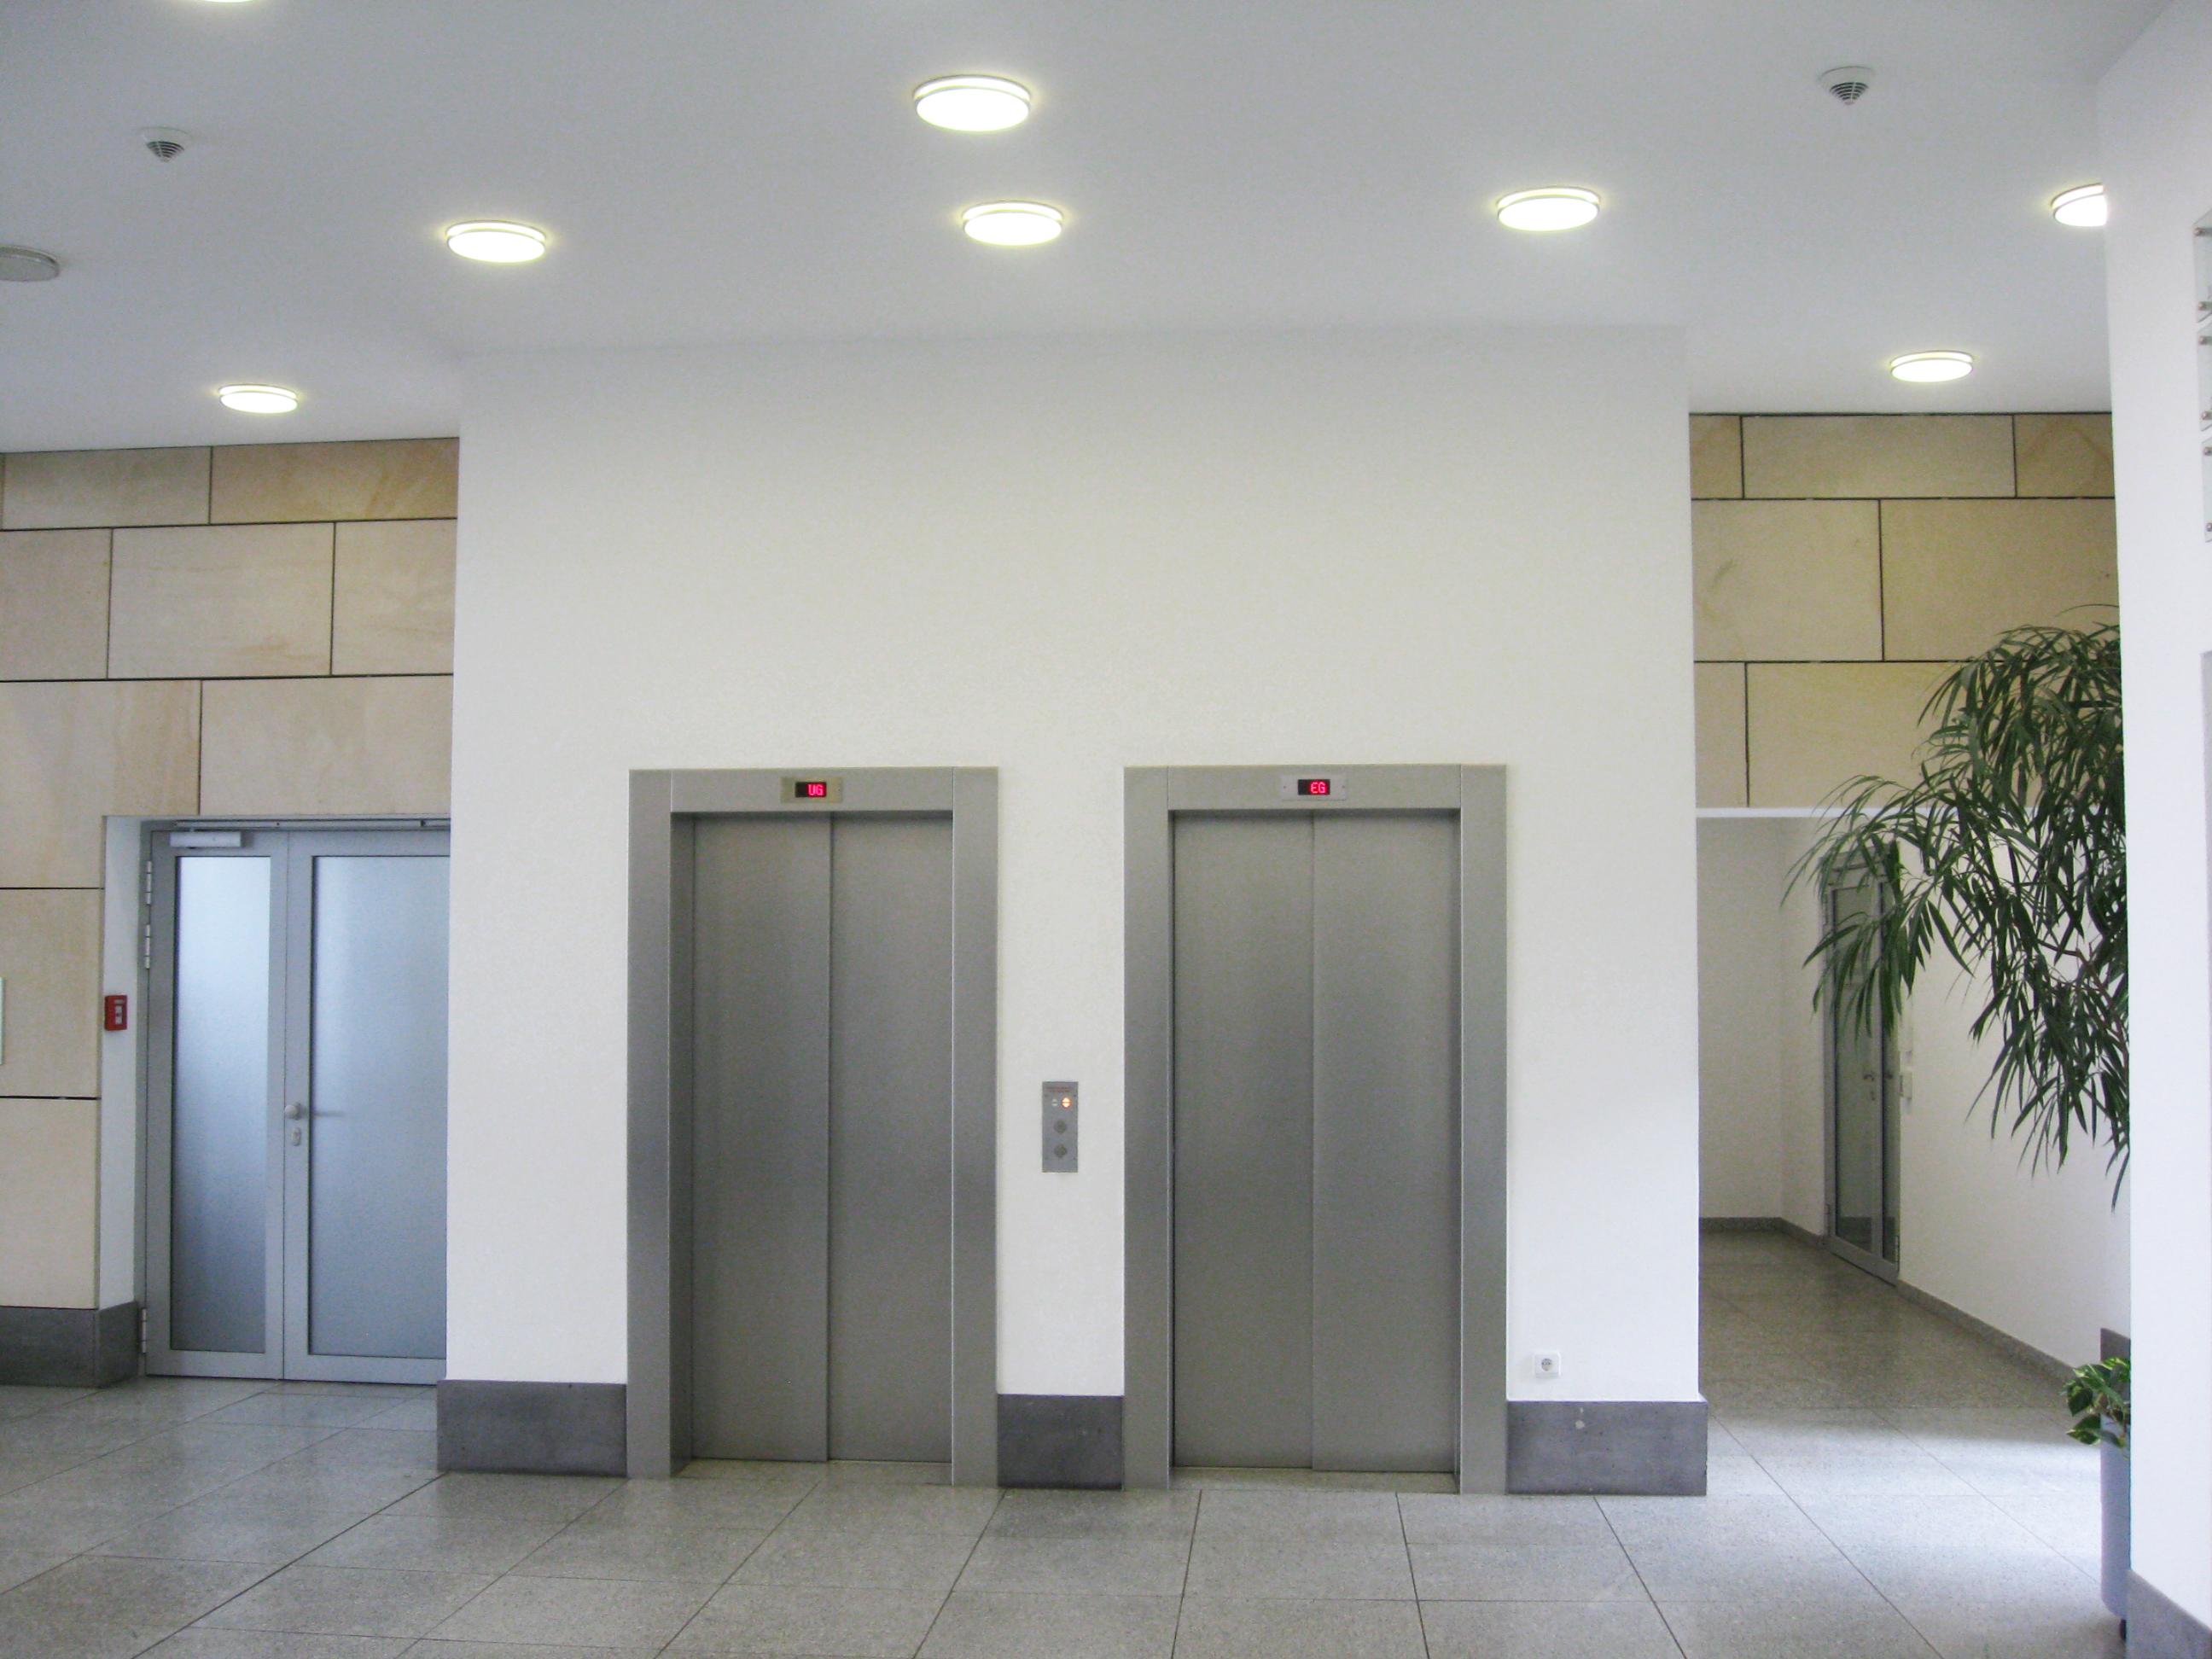 Eingangshalle Bürogebäude Hugenottenallee Neu-Isenburg